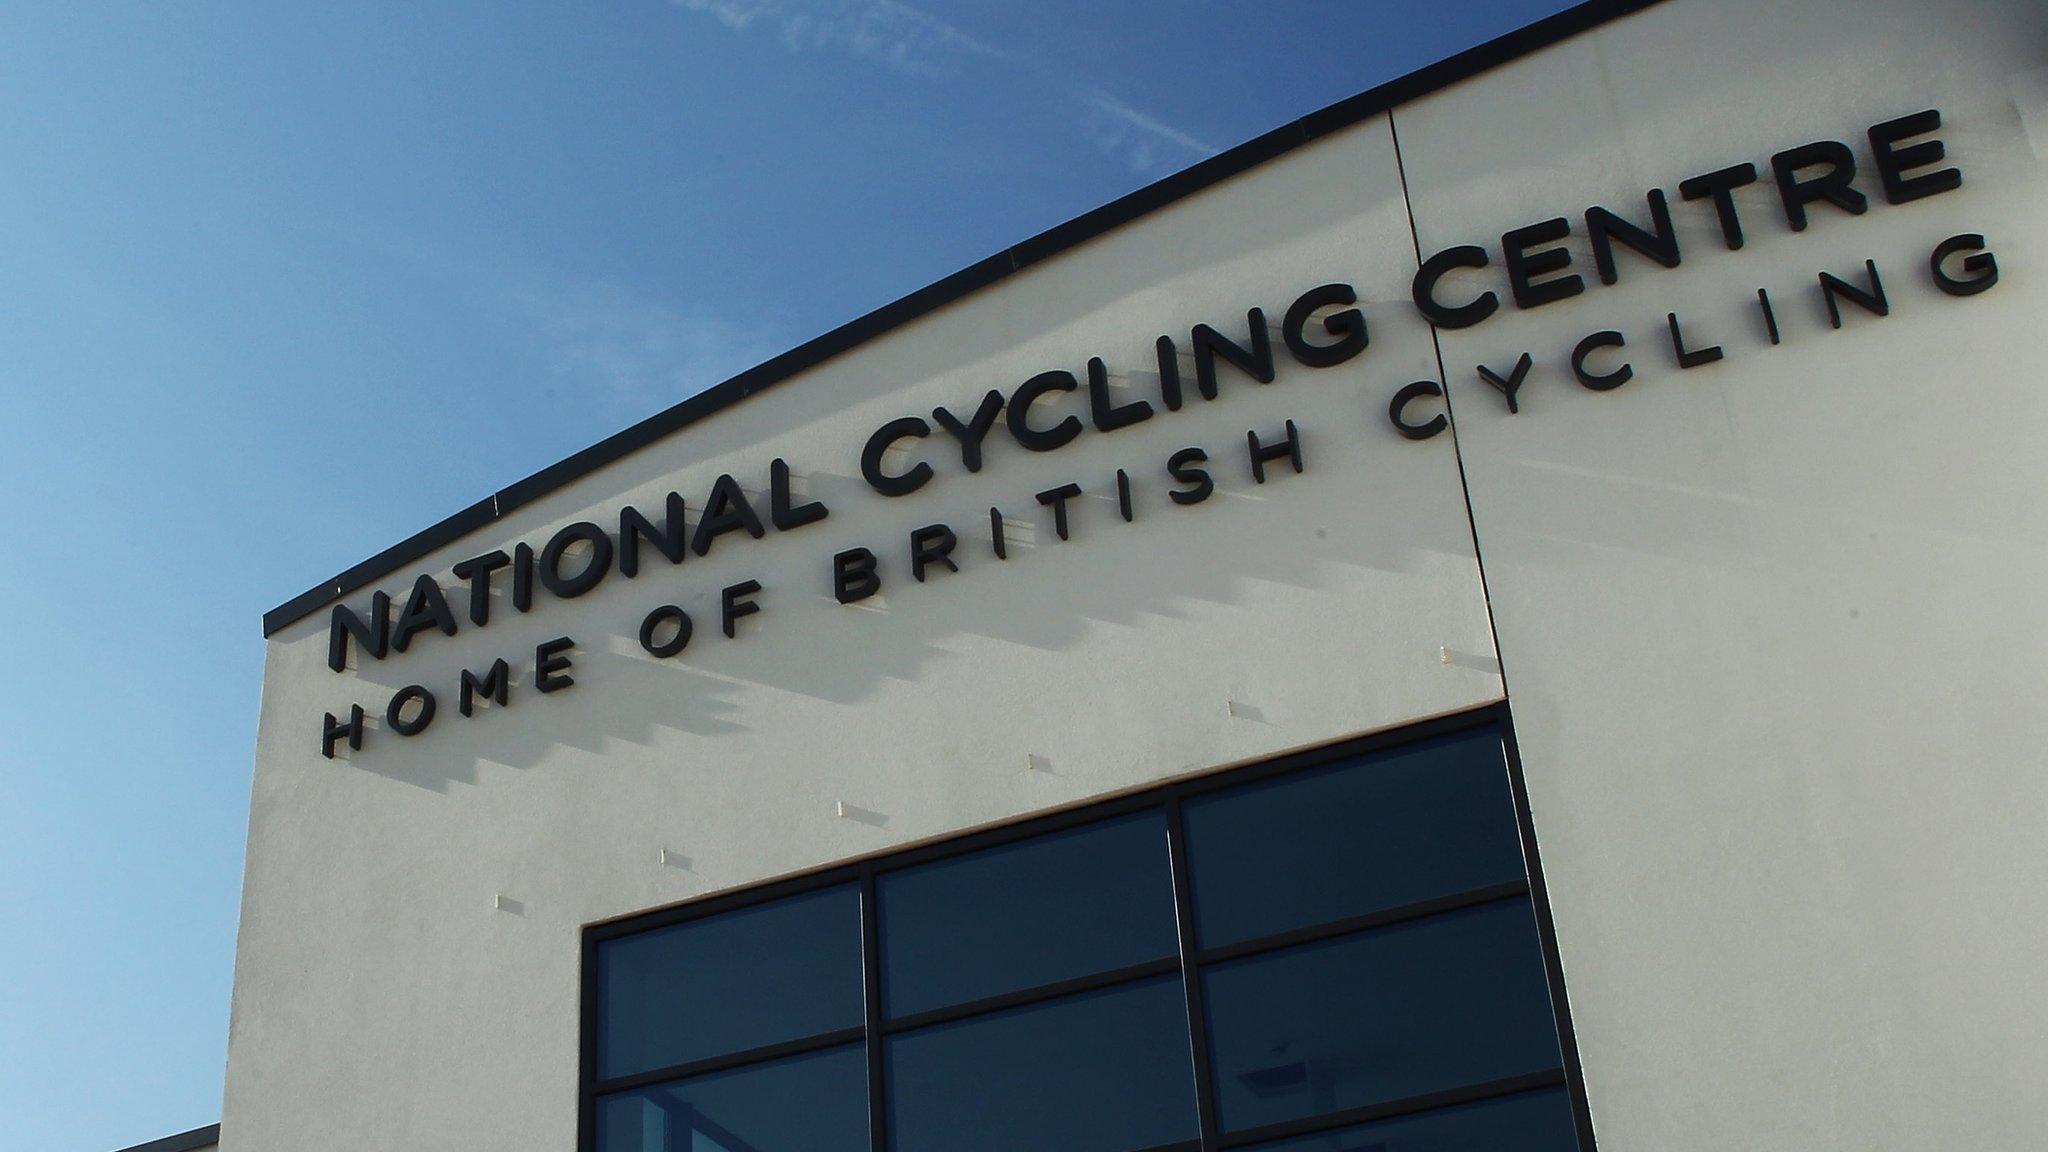 British Cycling failures hindered jiffy-bag inquiry - UK Anti-Doping